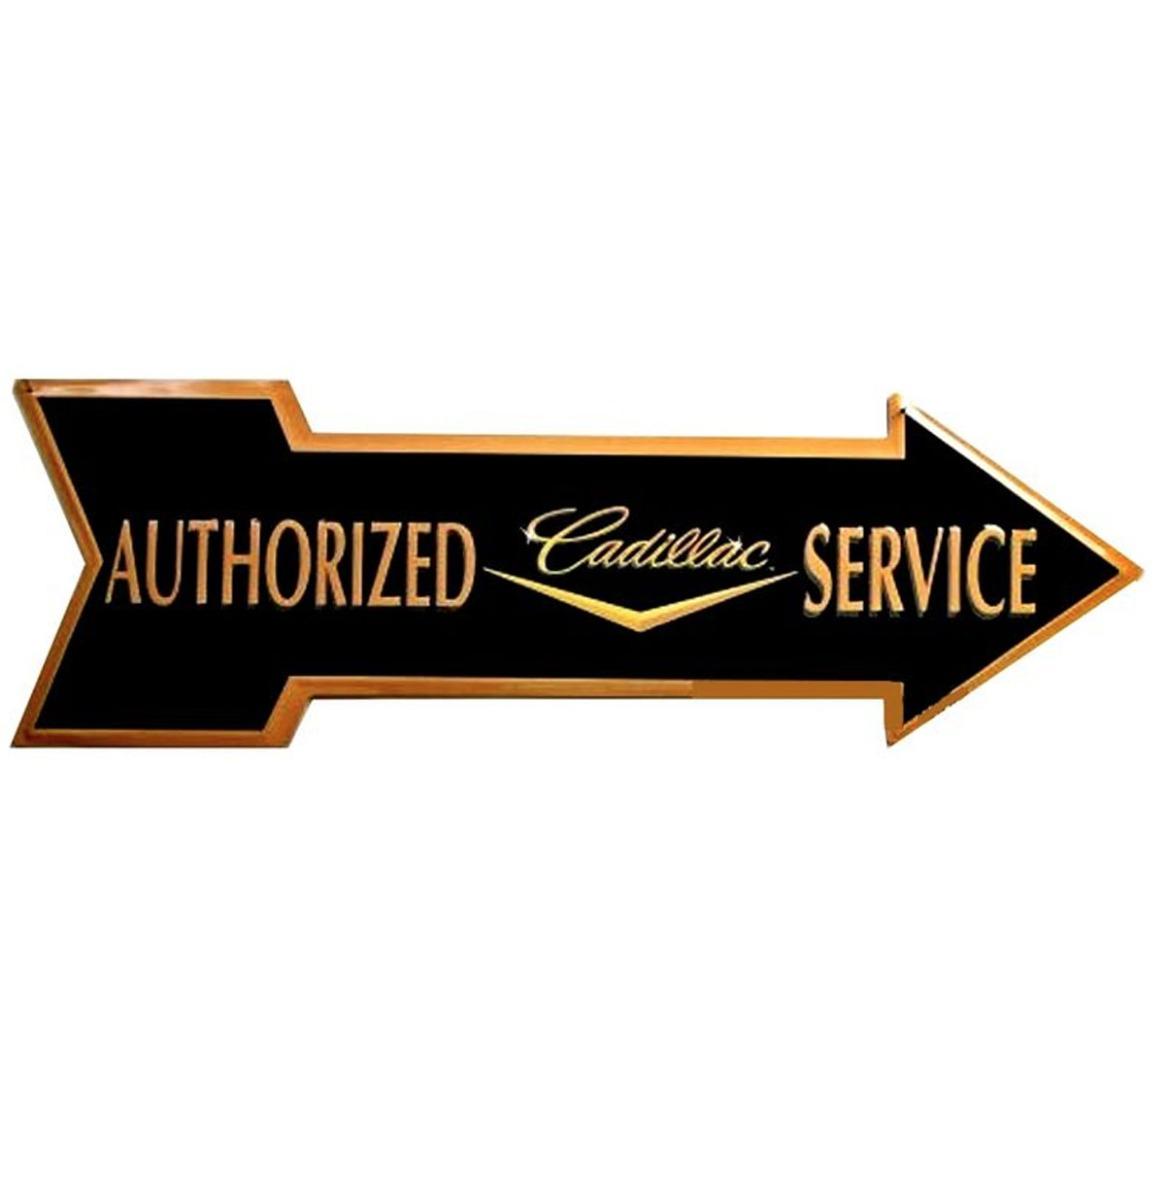 Cadillac Service Arrow Aluminum Sign 69 x 21 cm